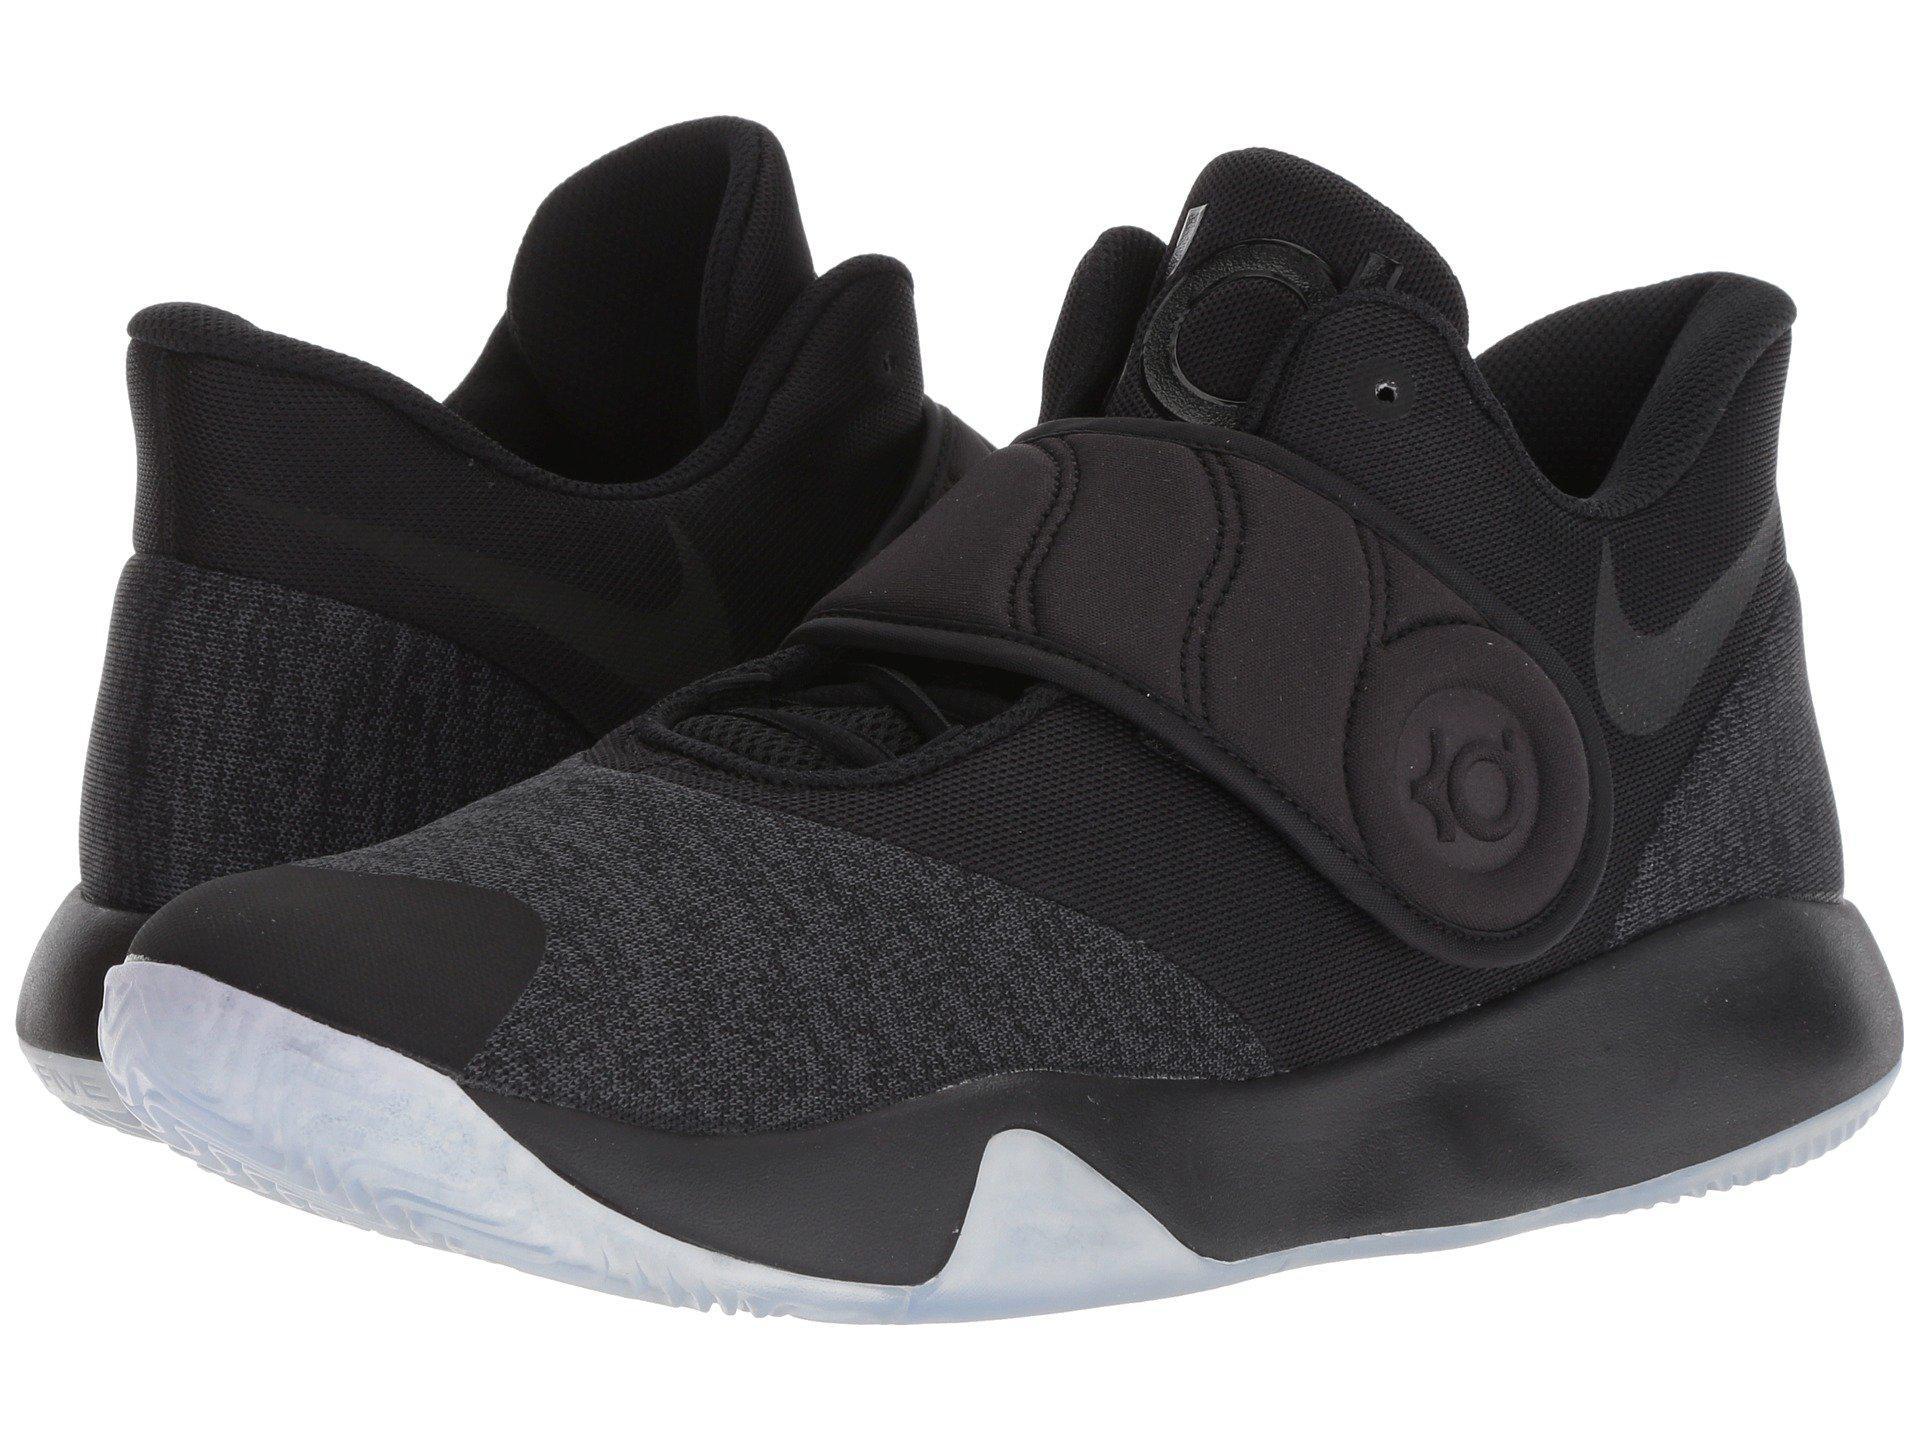 meet 3c300 11814 Nike Kd Trey 5 Vi (black black dark Grey clear) Men s Basketball ...